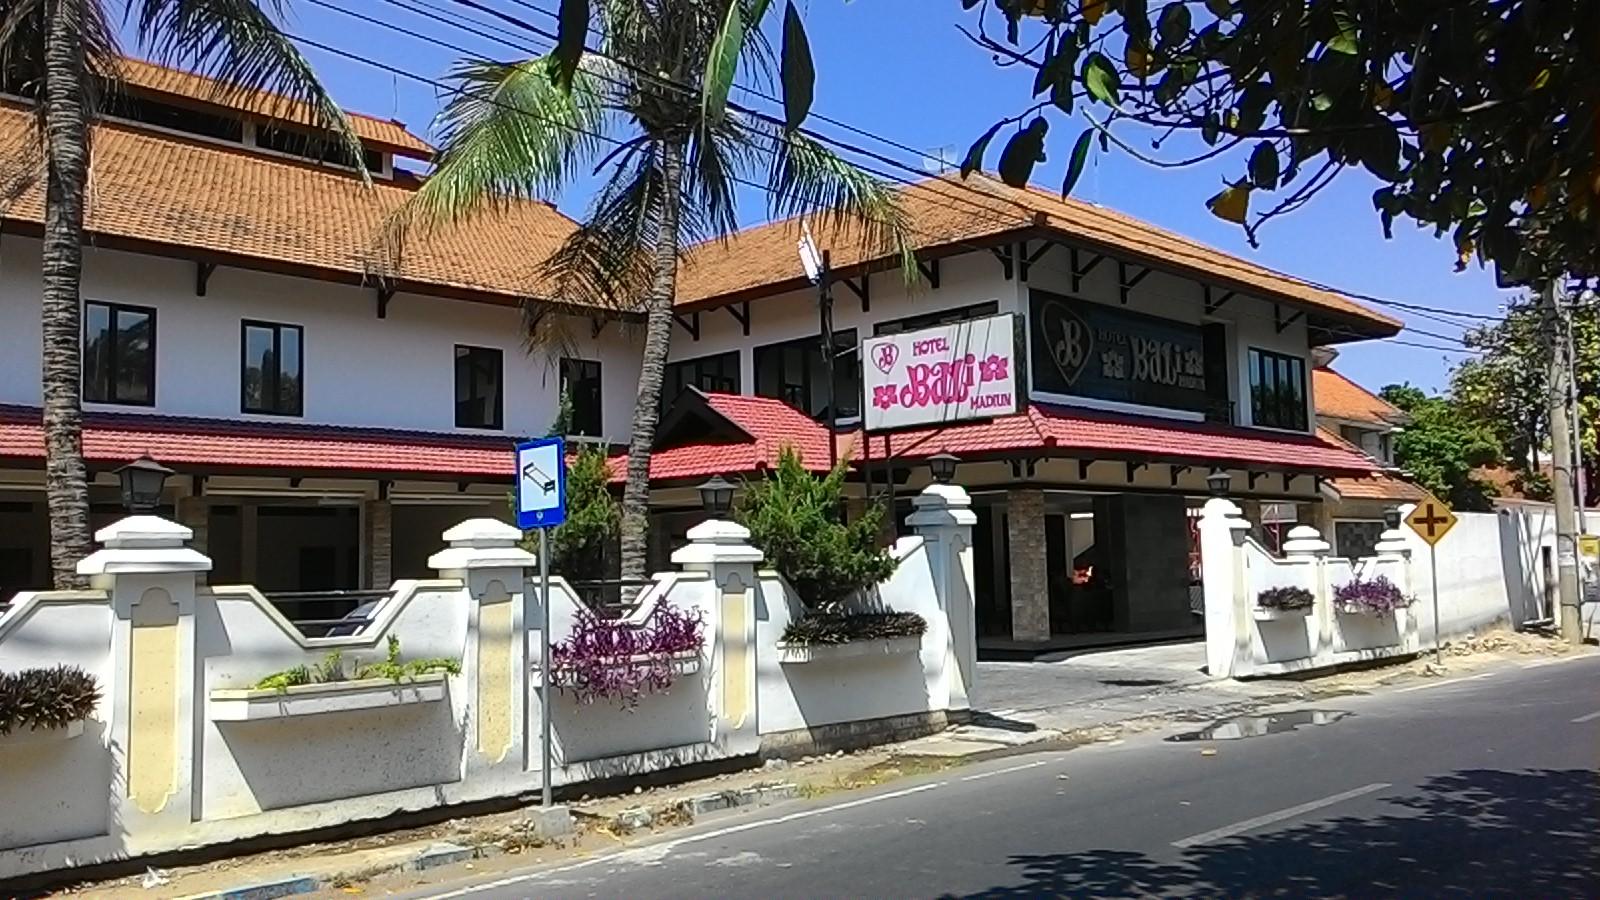 hotel bali kota madya madiun rh wikimapia org hotel bintang 3 di madiun jawa timur nama hotel di madiun jawa timur